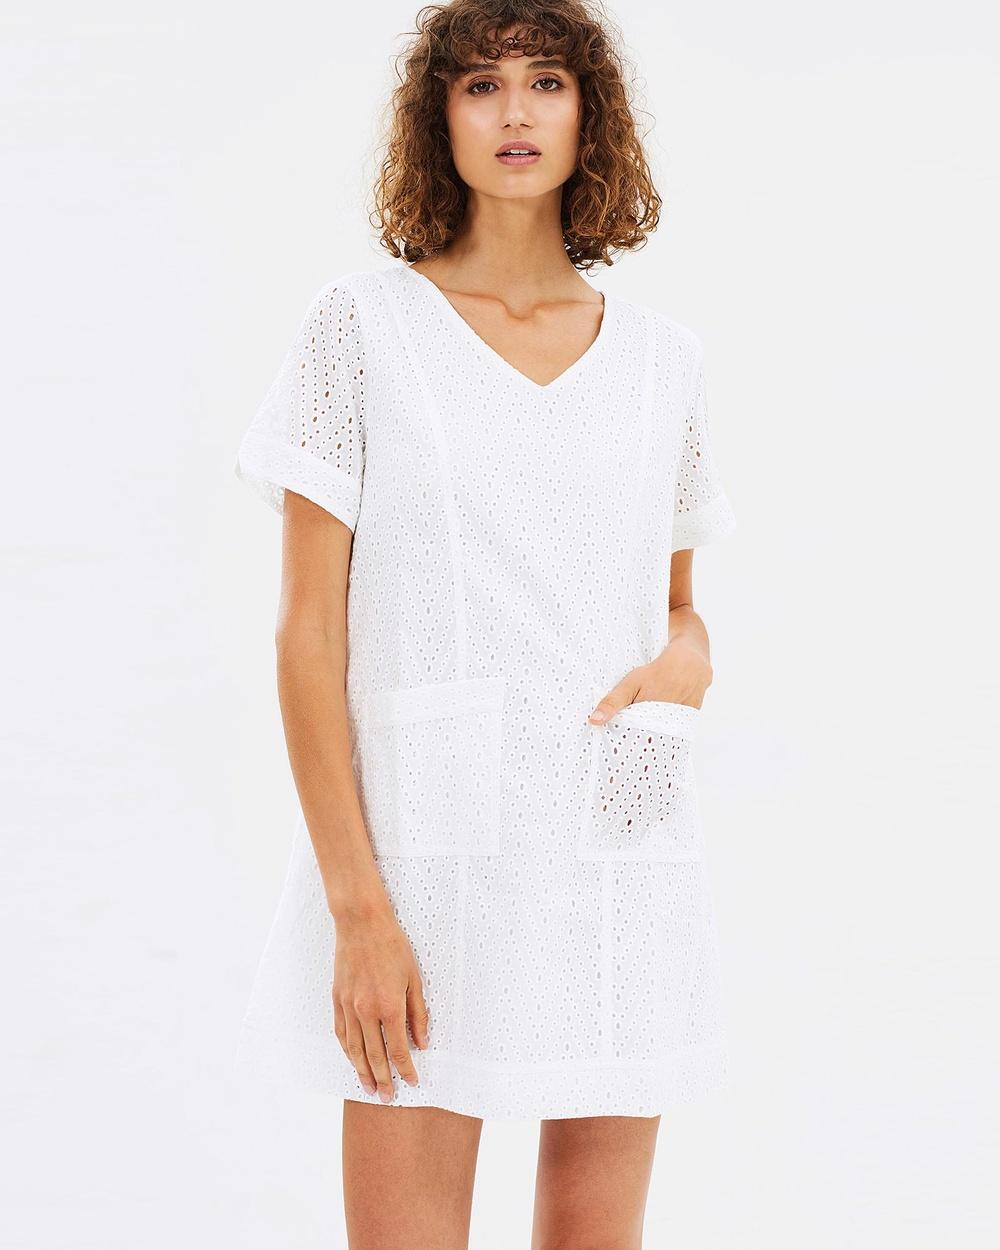 Ryder White Lina Lace Shift Dress